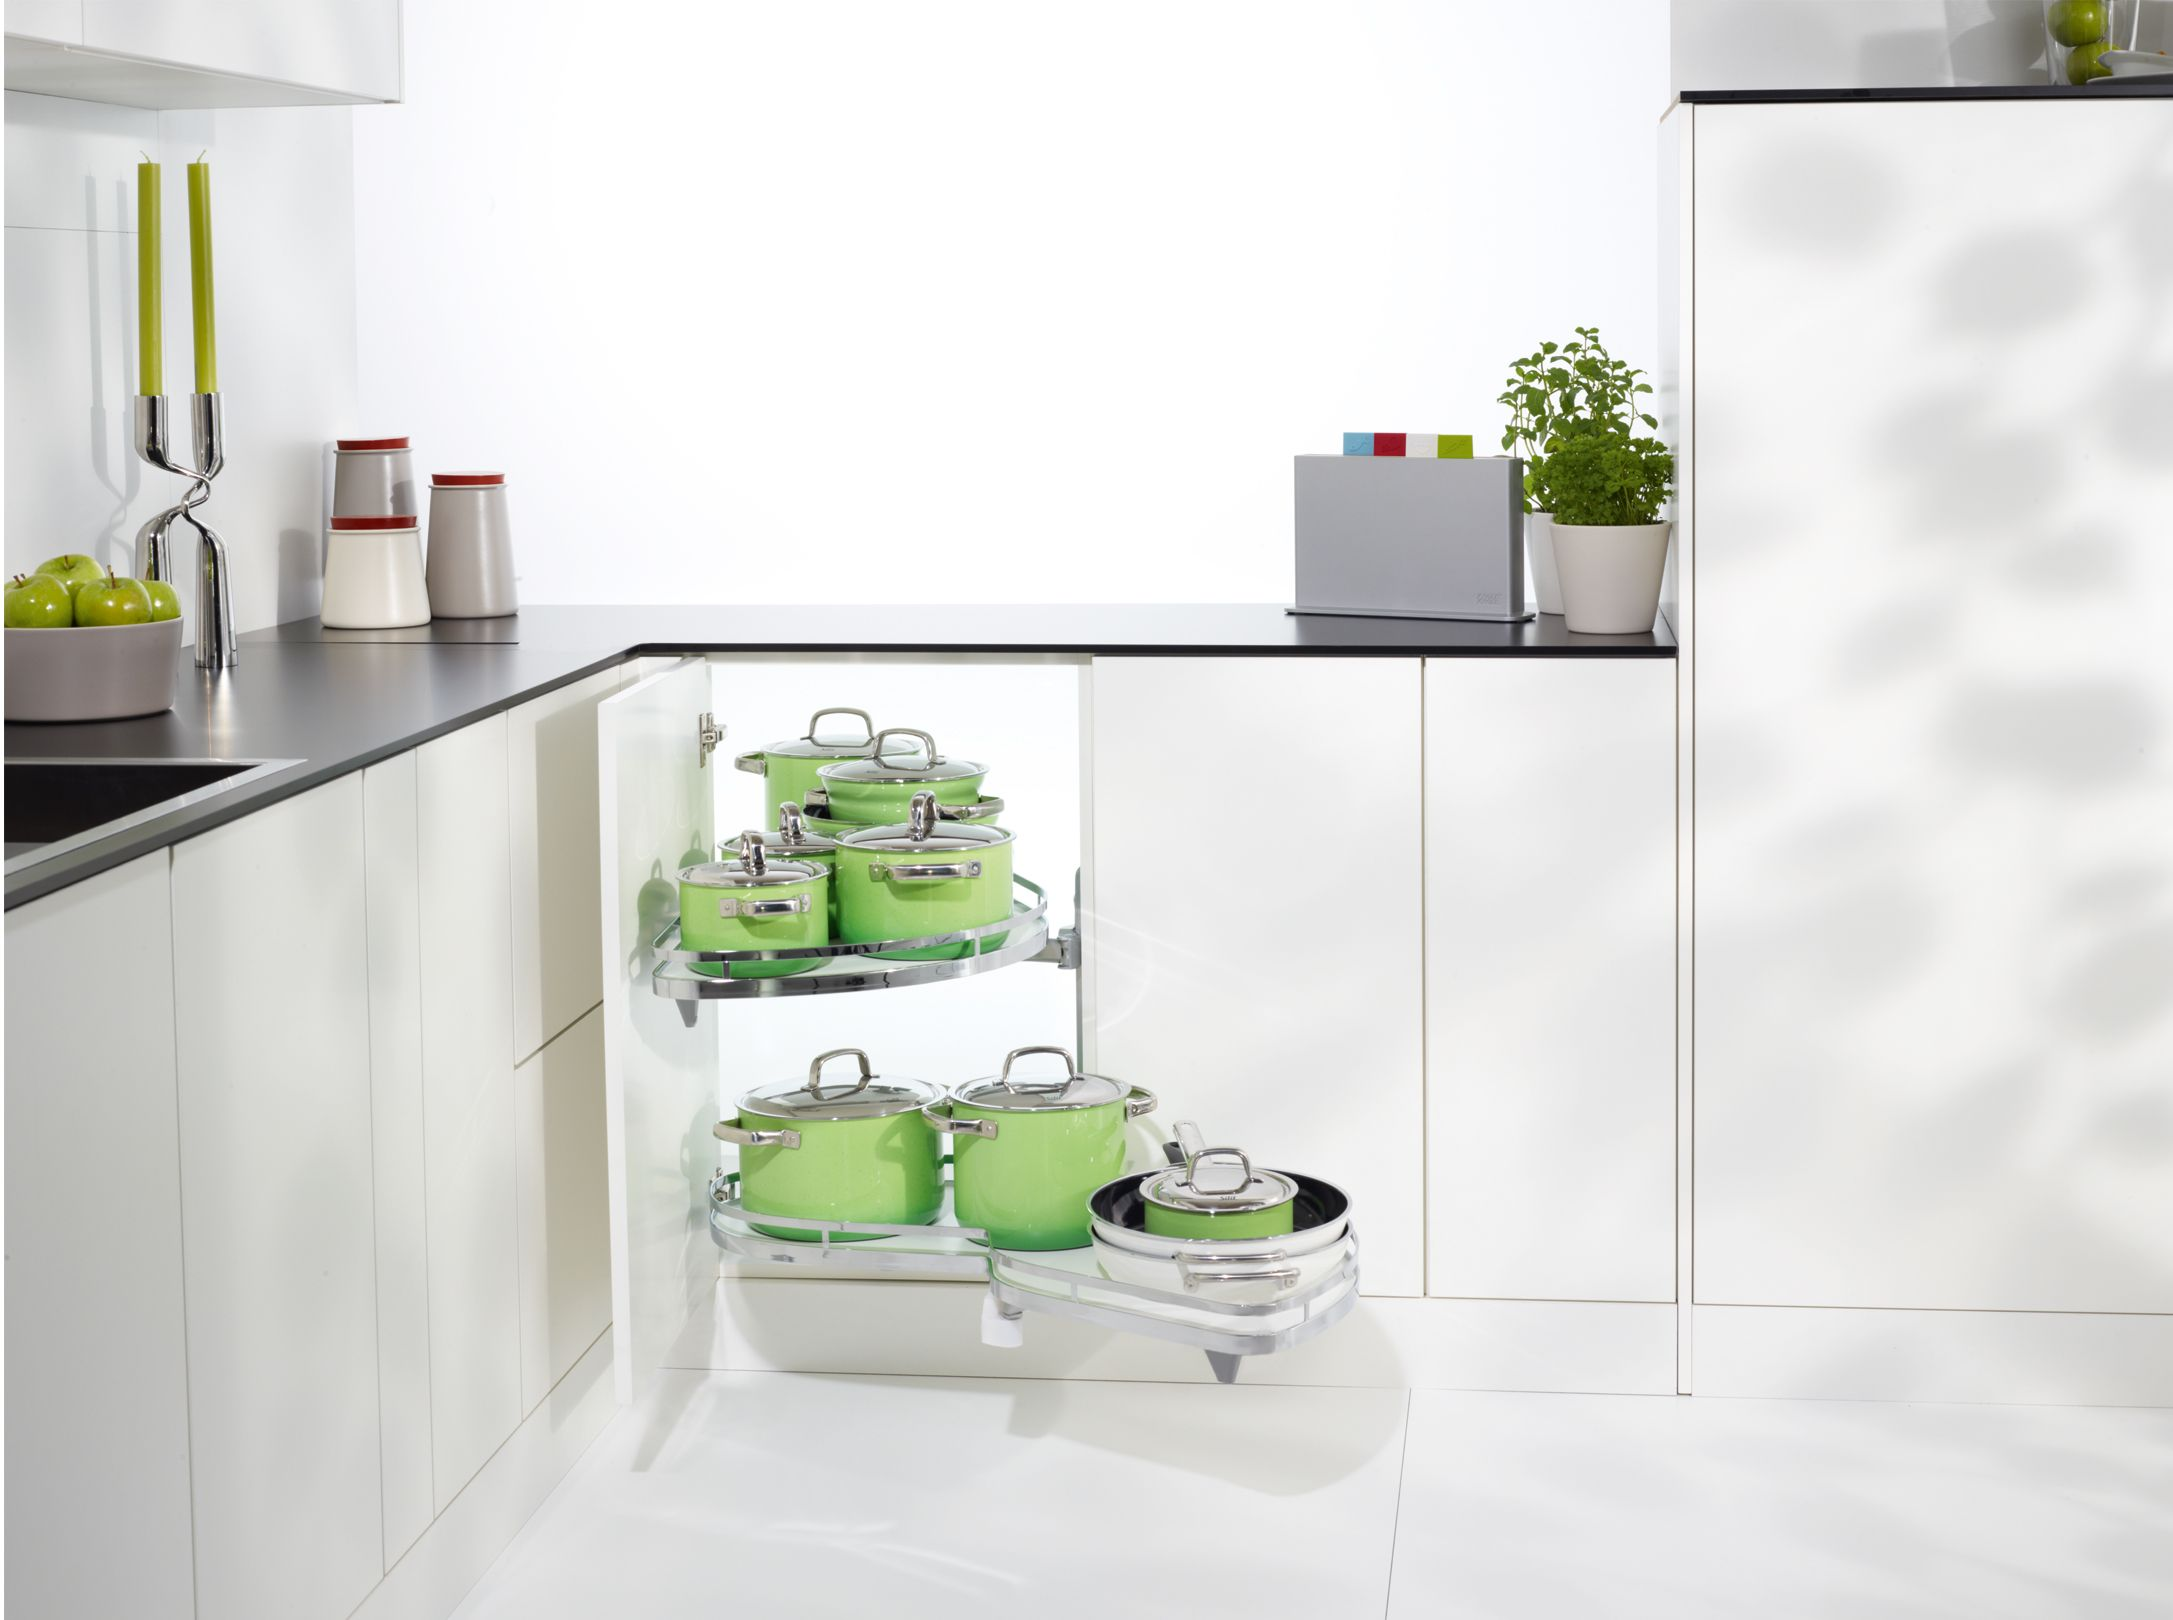 hafele | Hafele | HAFELE | Pinterest | Kitchen blinds, Door ...